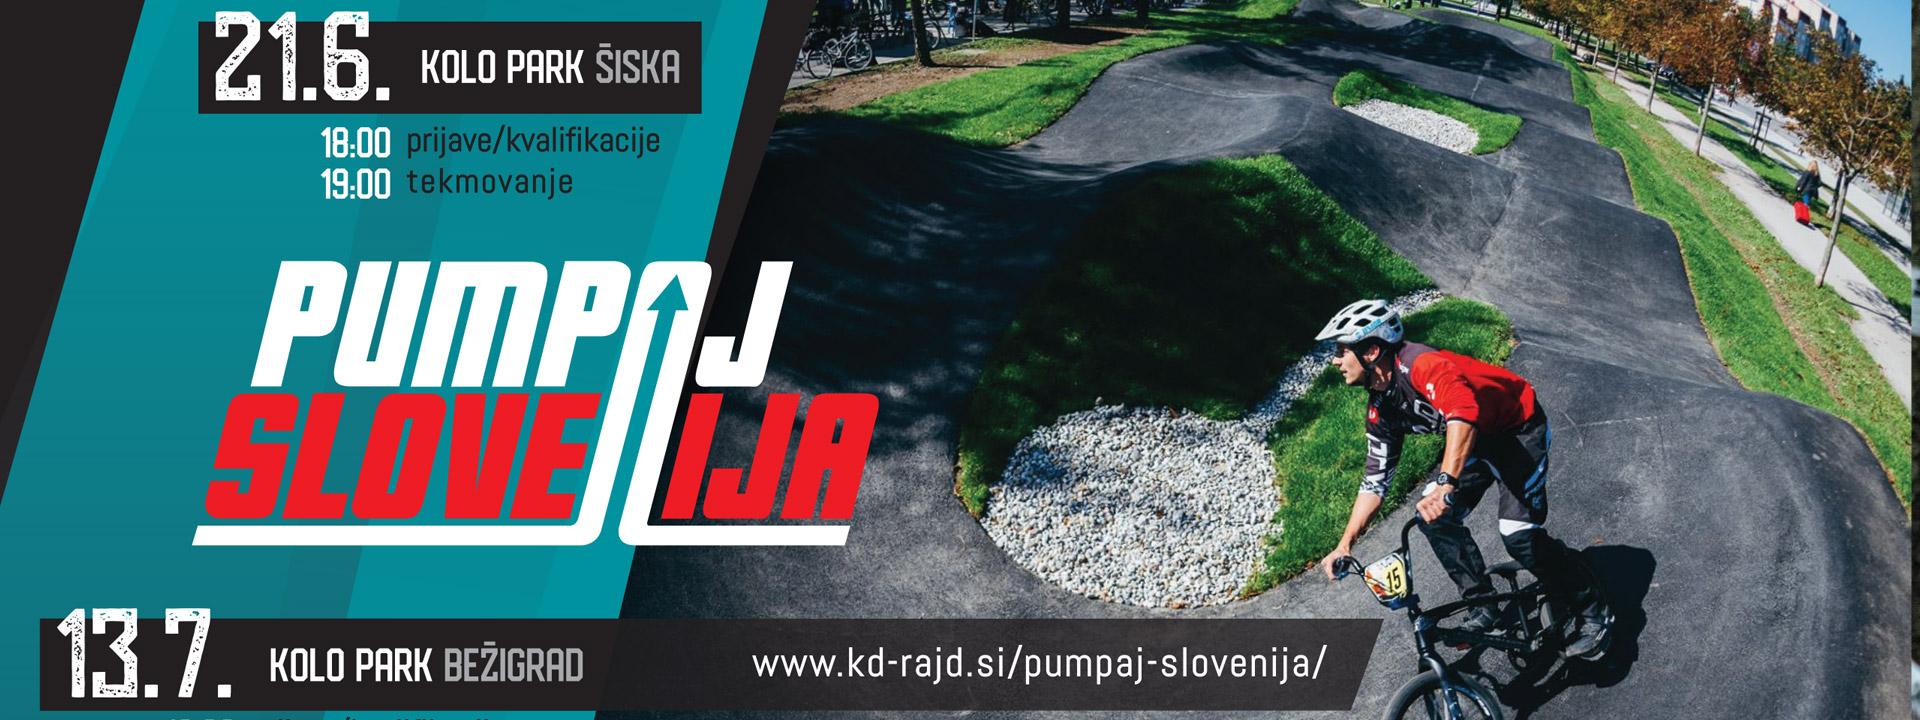 _1806-pumpaj-slovenija